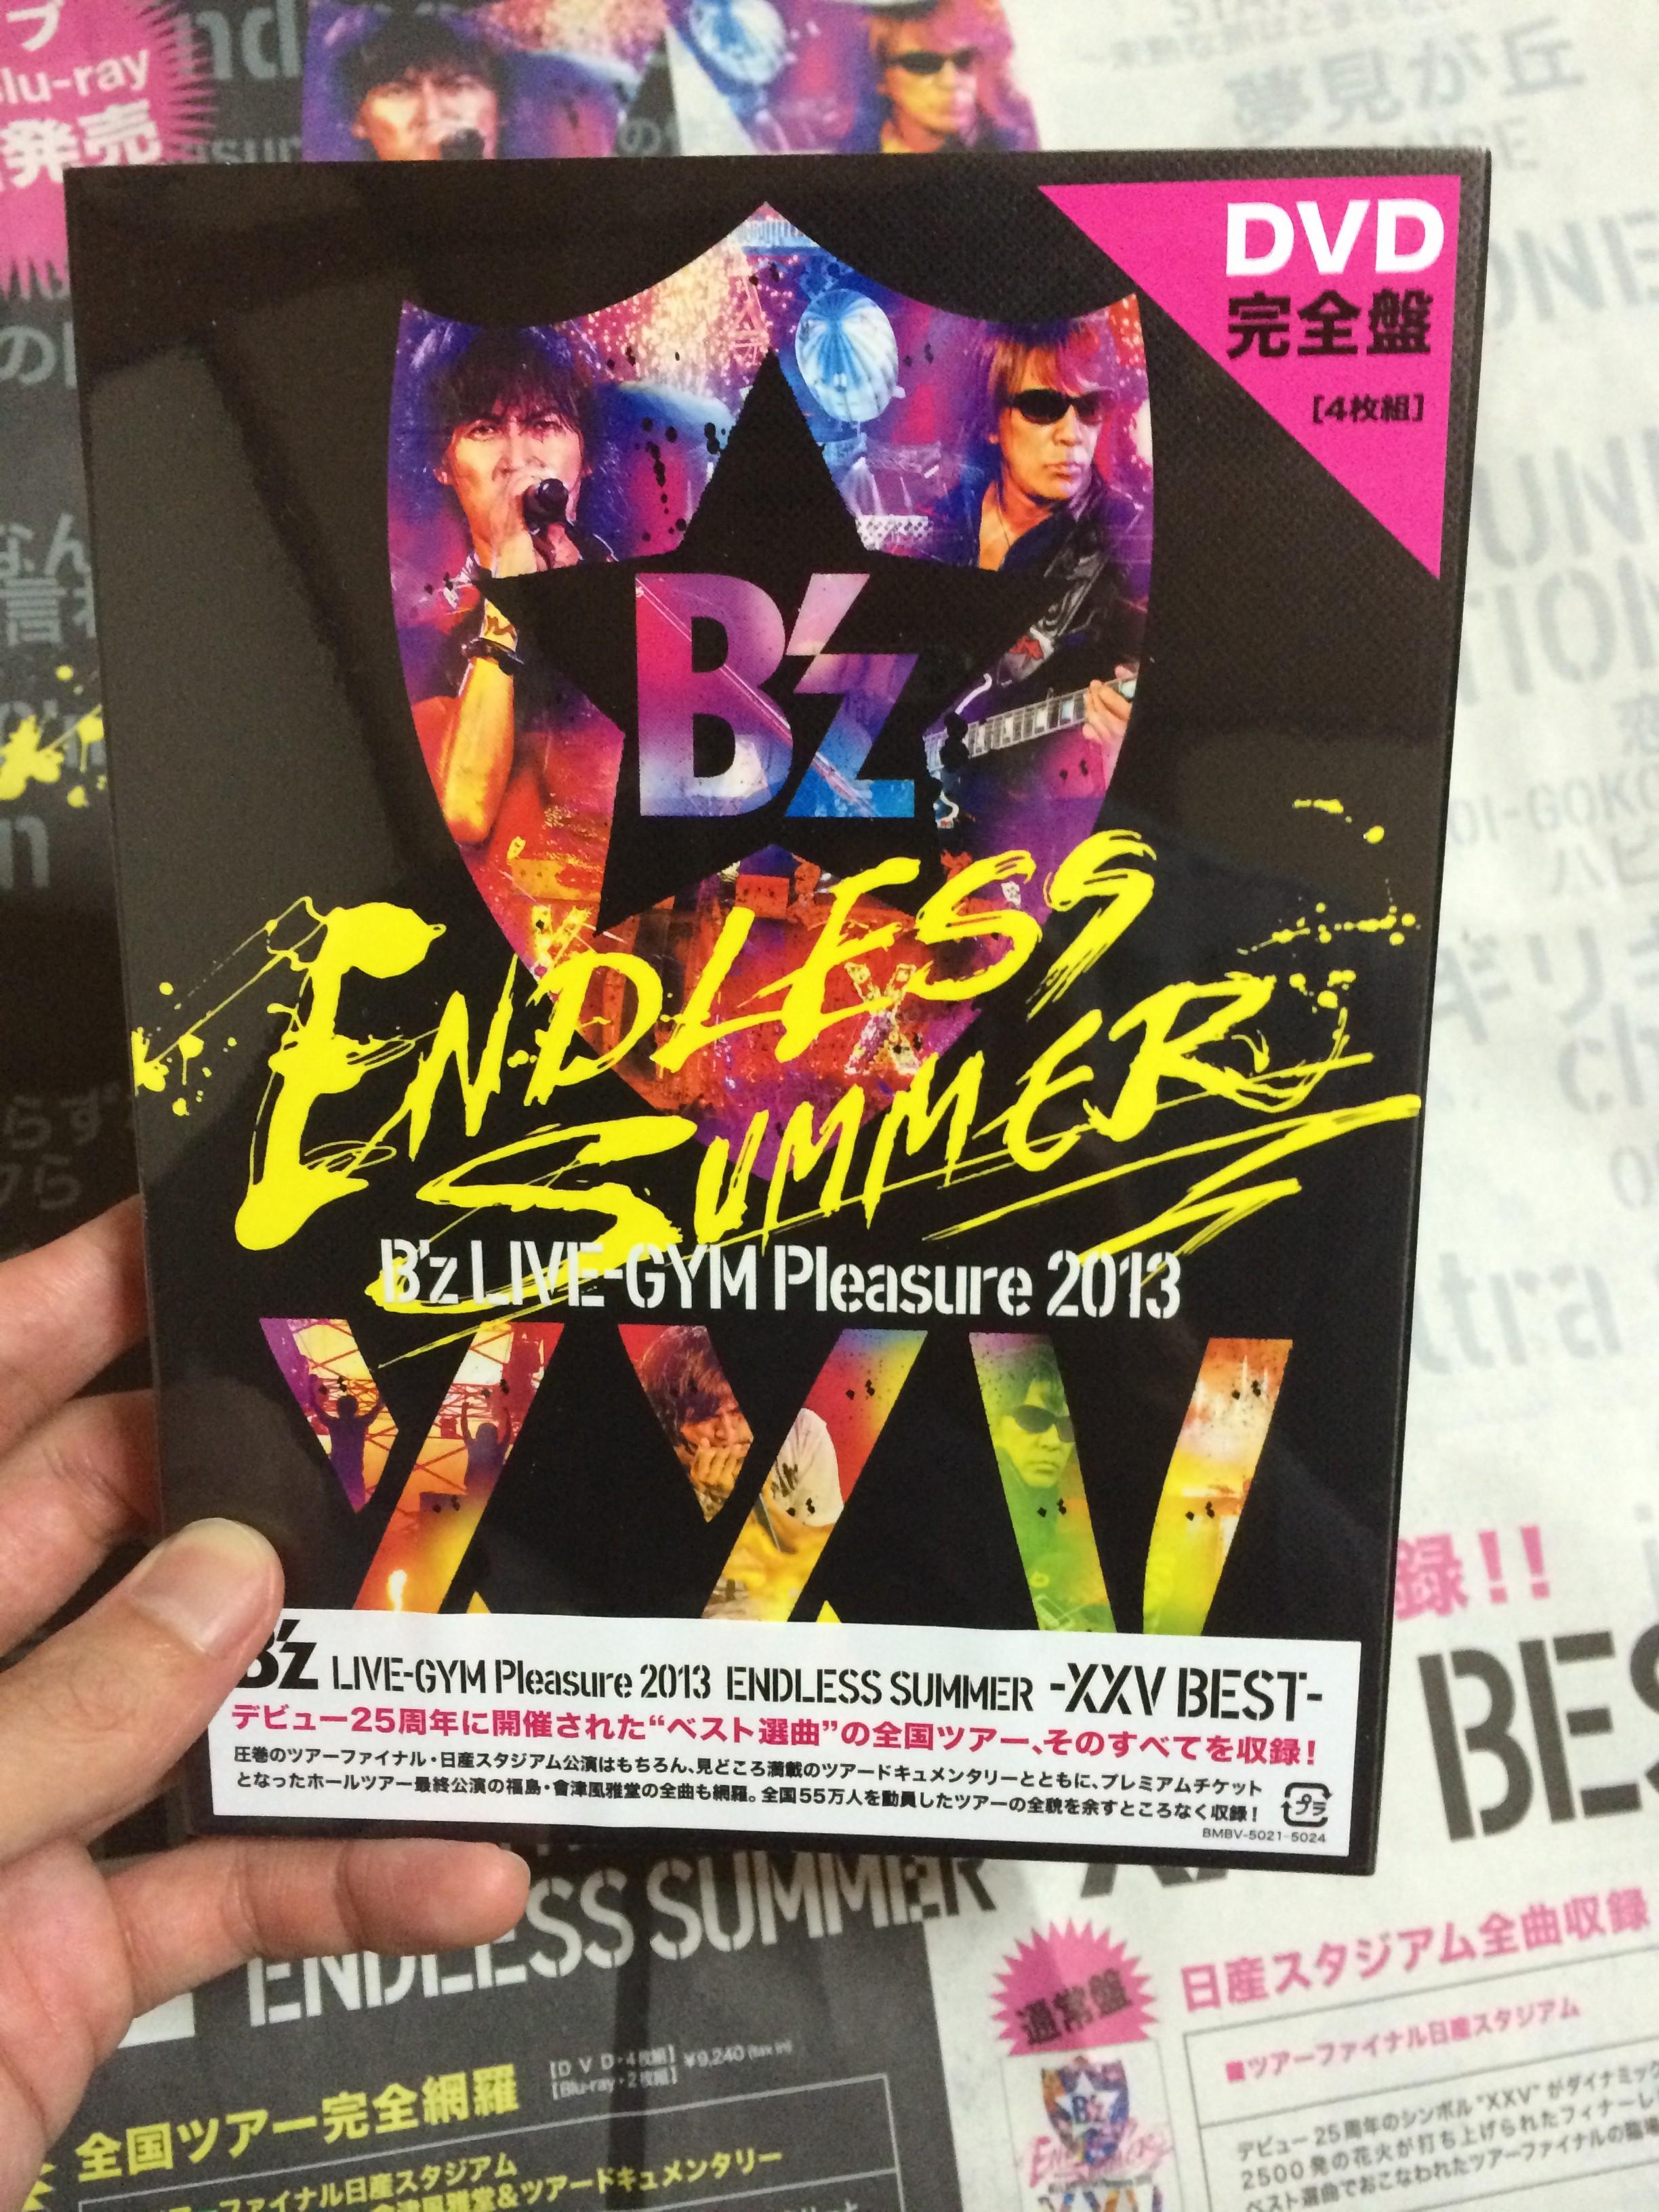 B'zエンドレスサマーDVD遂にゲット!感想~Disc1~